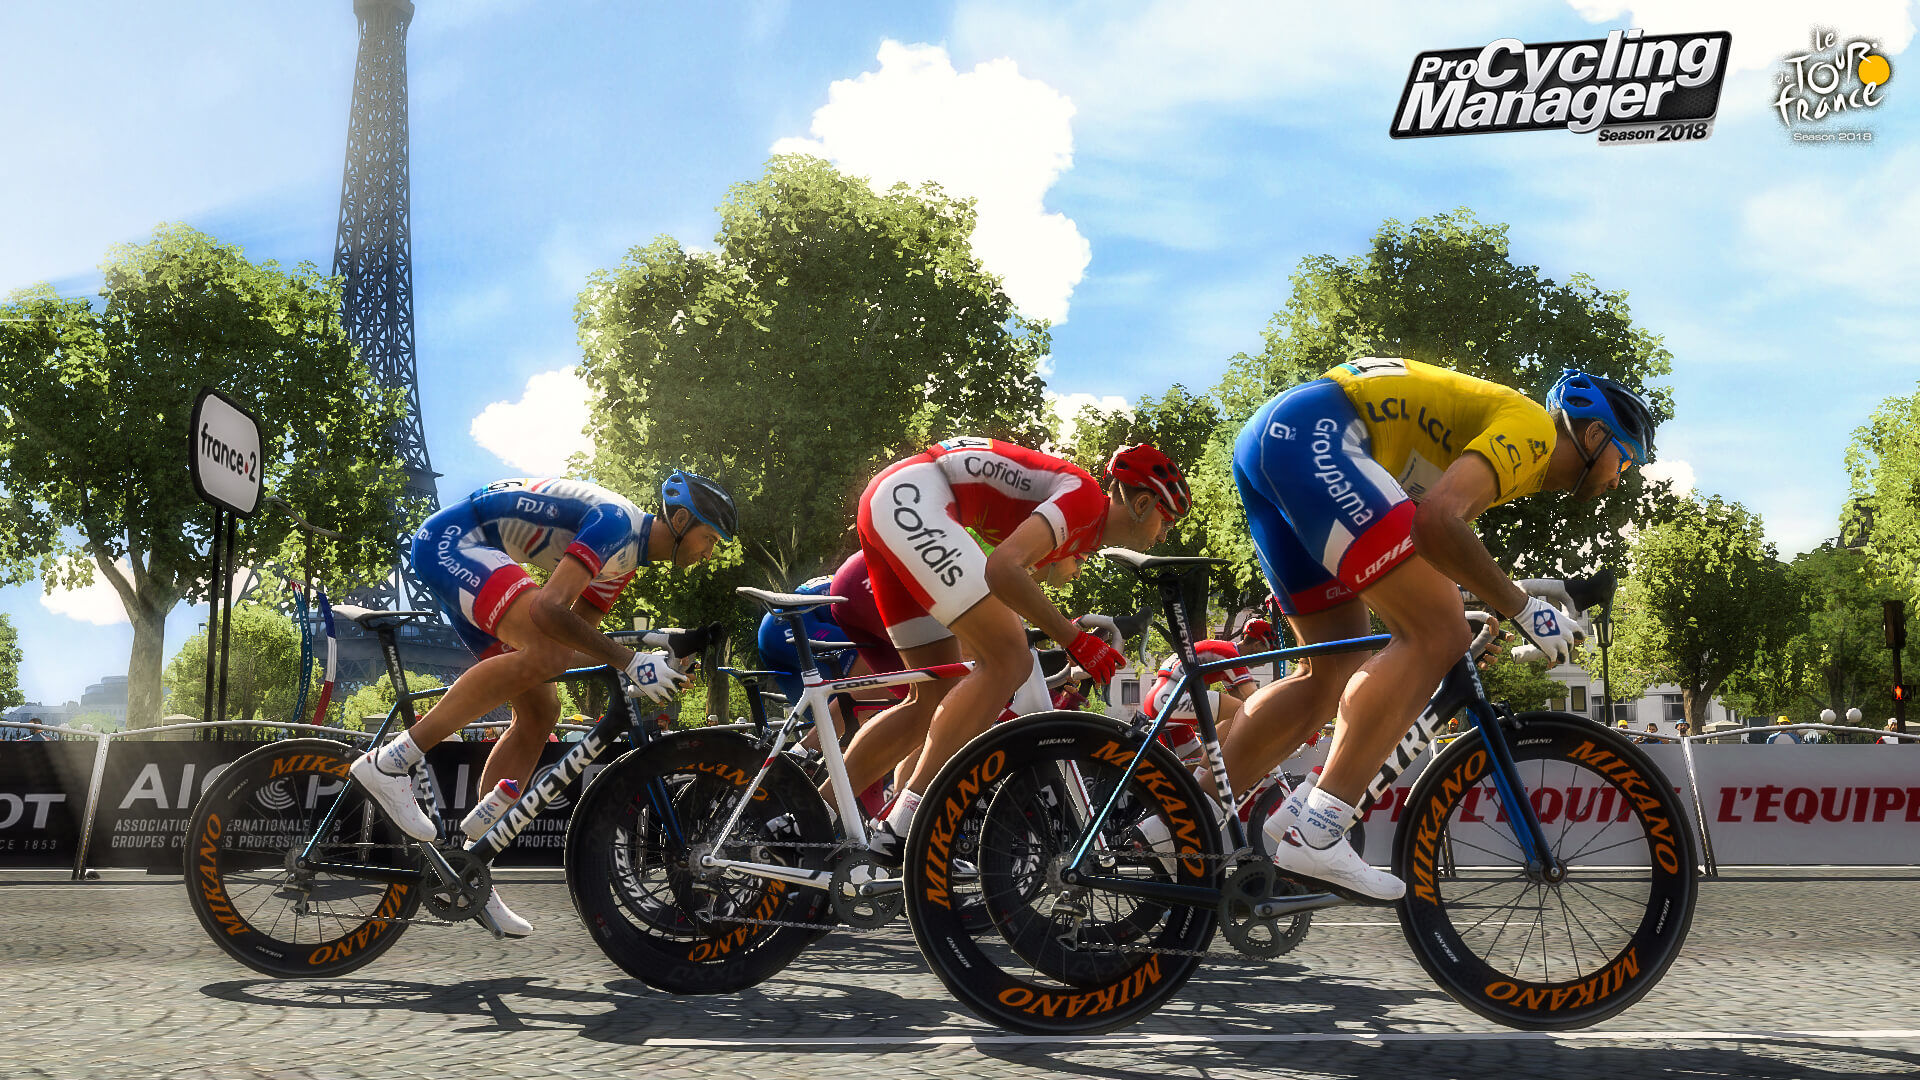 Bisiklet menajerlik oyunu Pro Cycling Manager 2018 duyuruldu